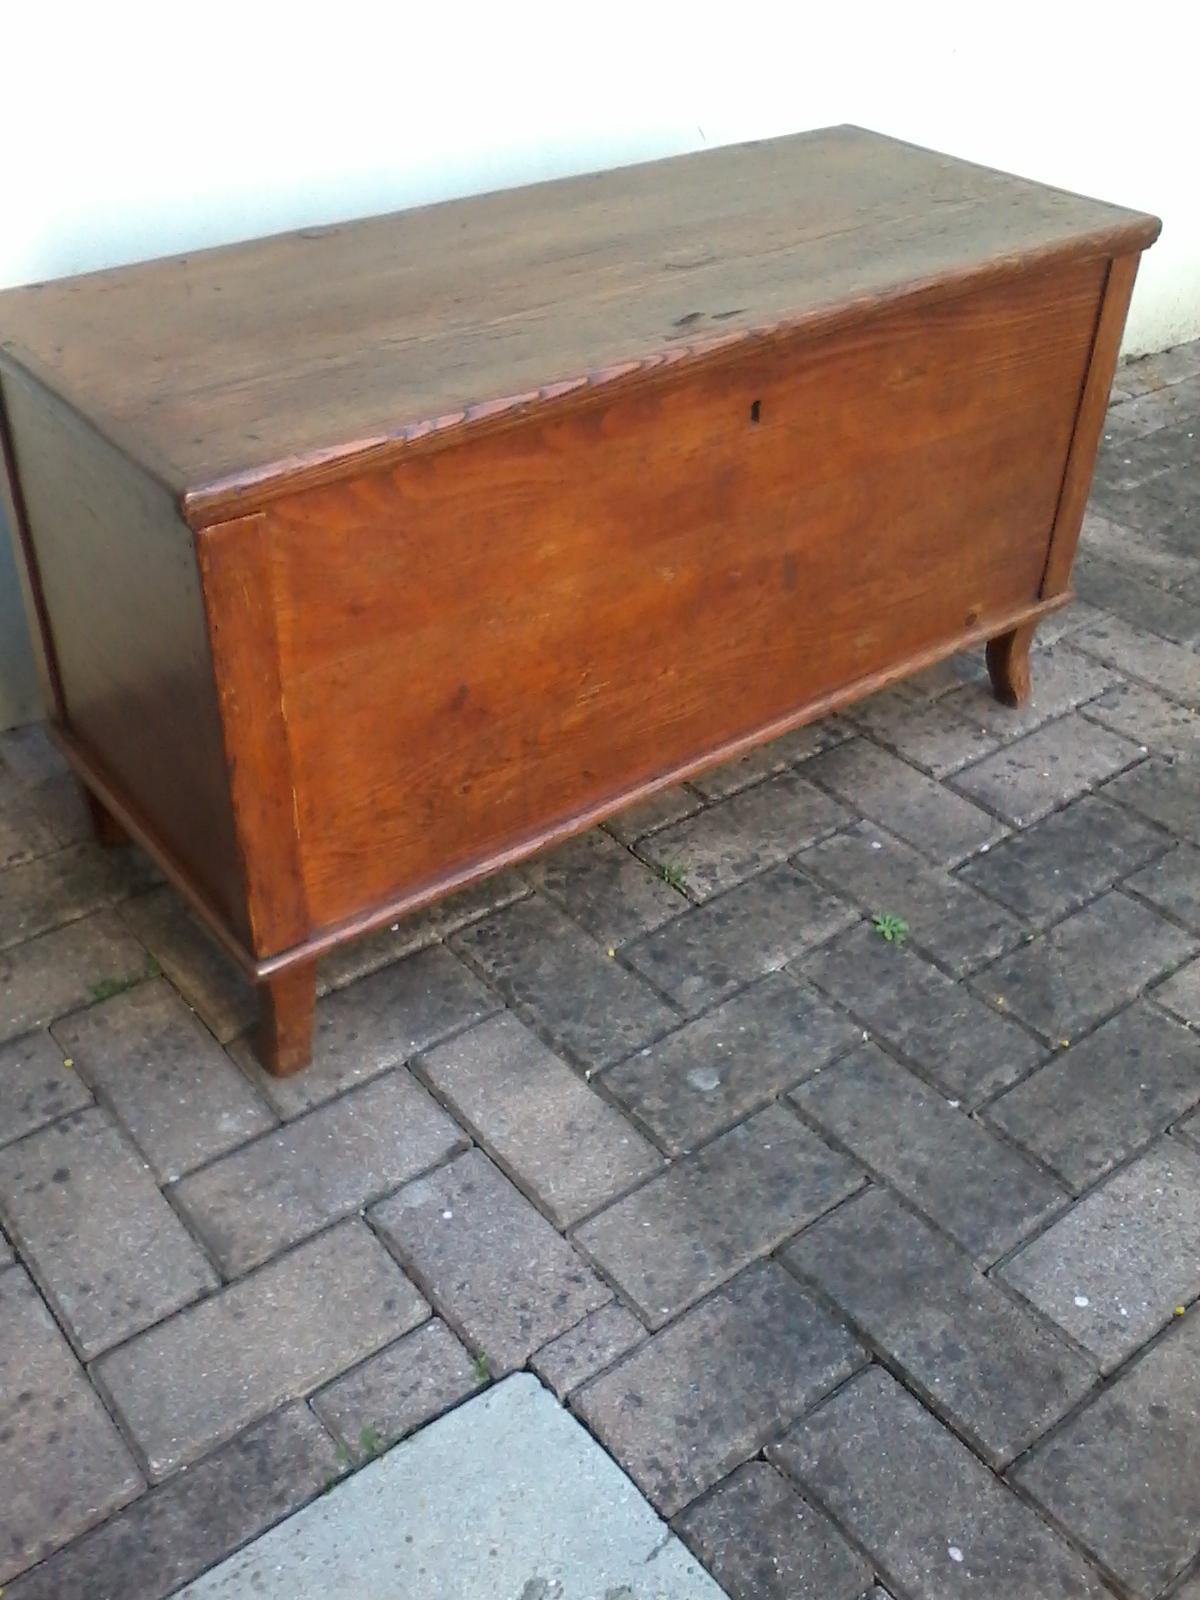 Anu cassapanca baule bauletto mobiletto legno antiquariato for Baule cassapanca legno